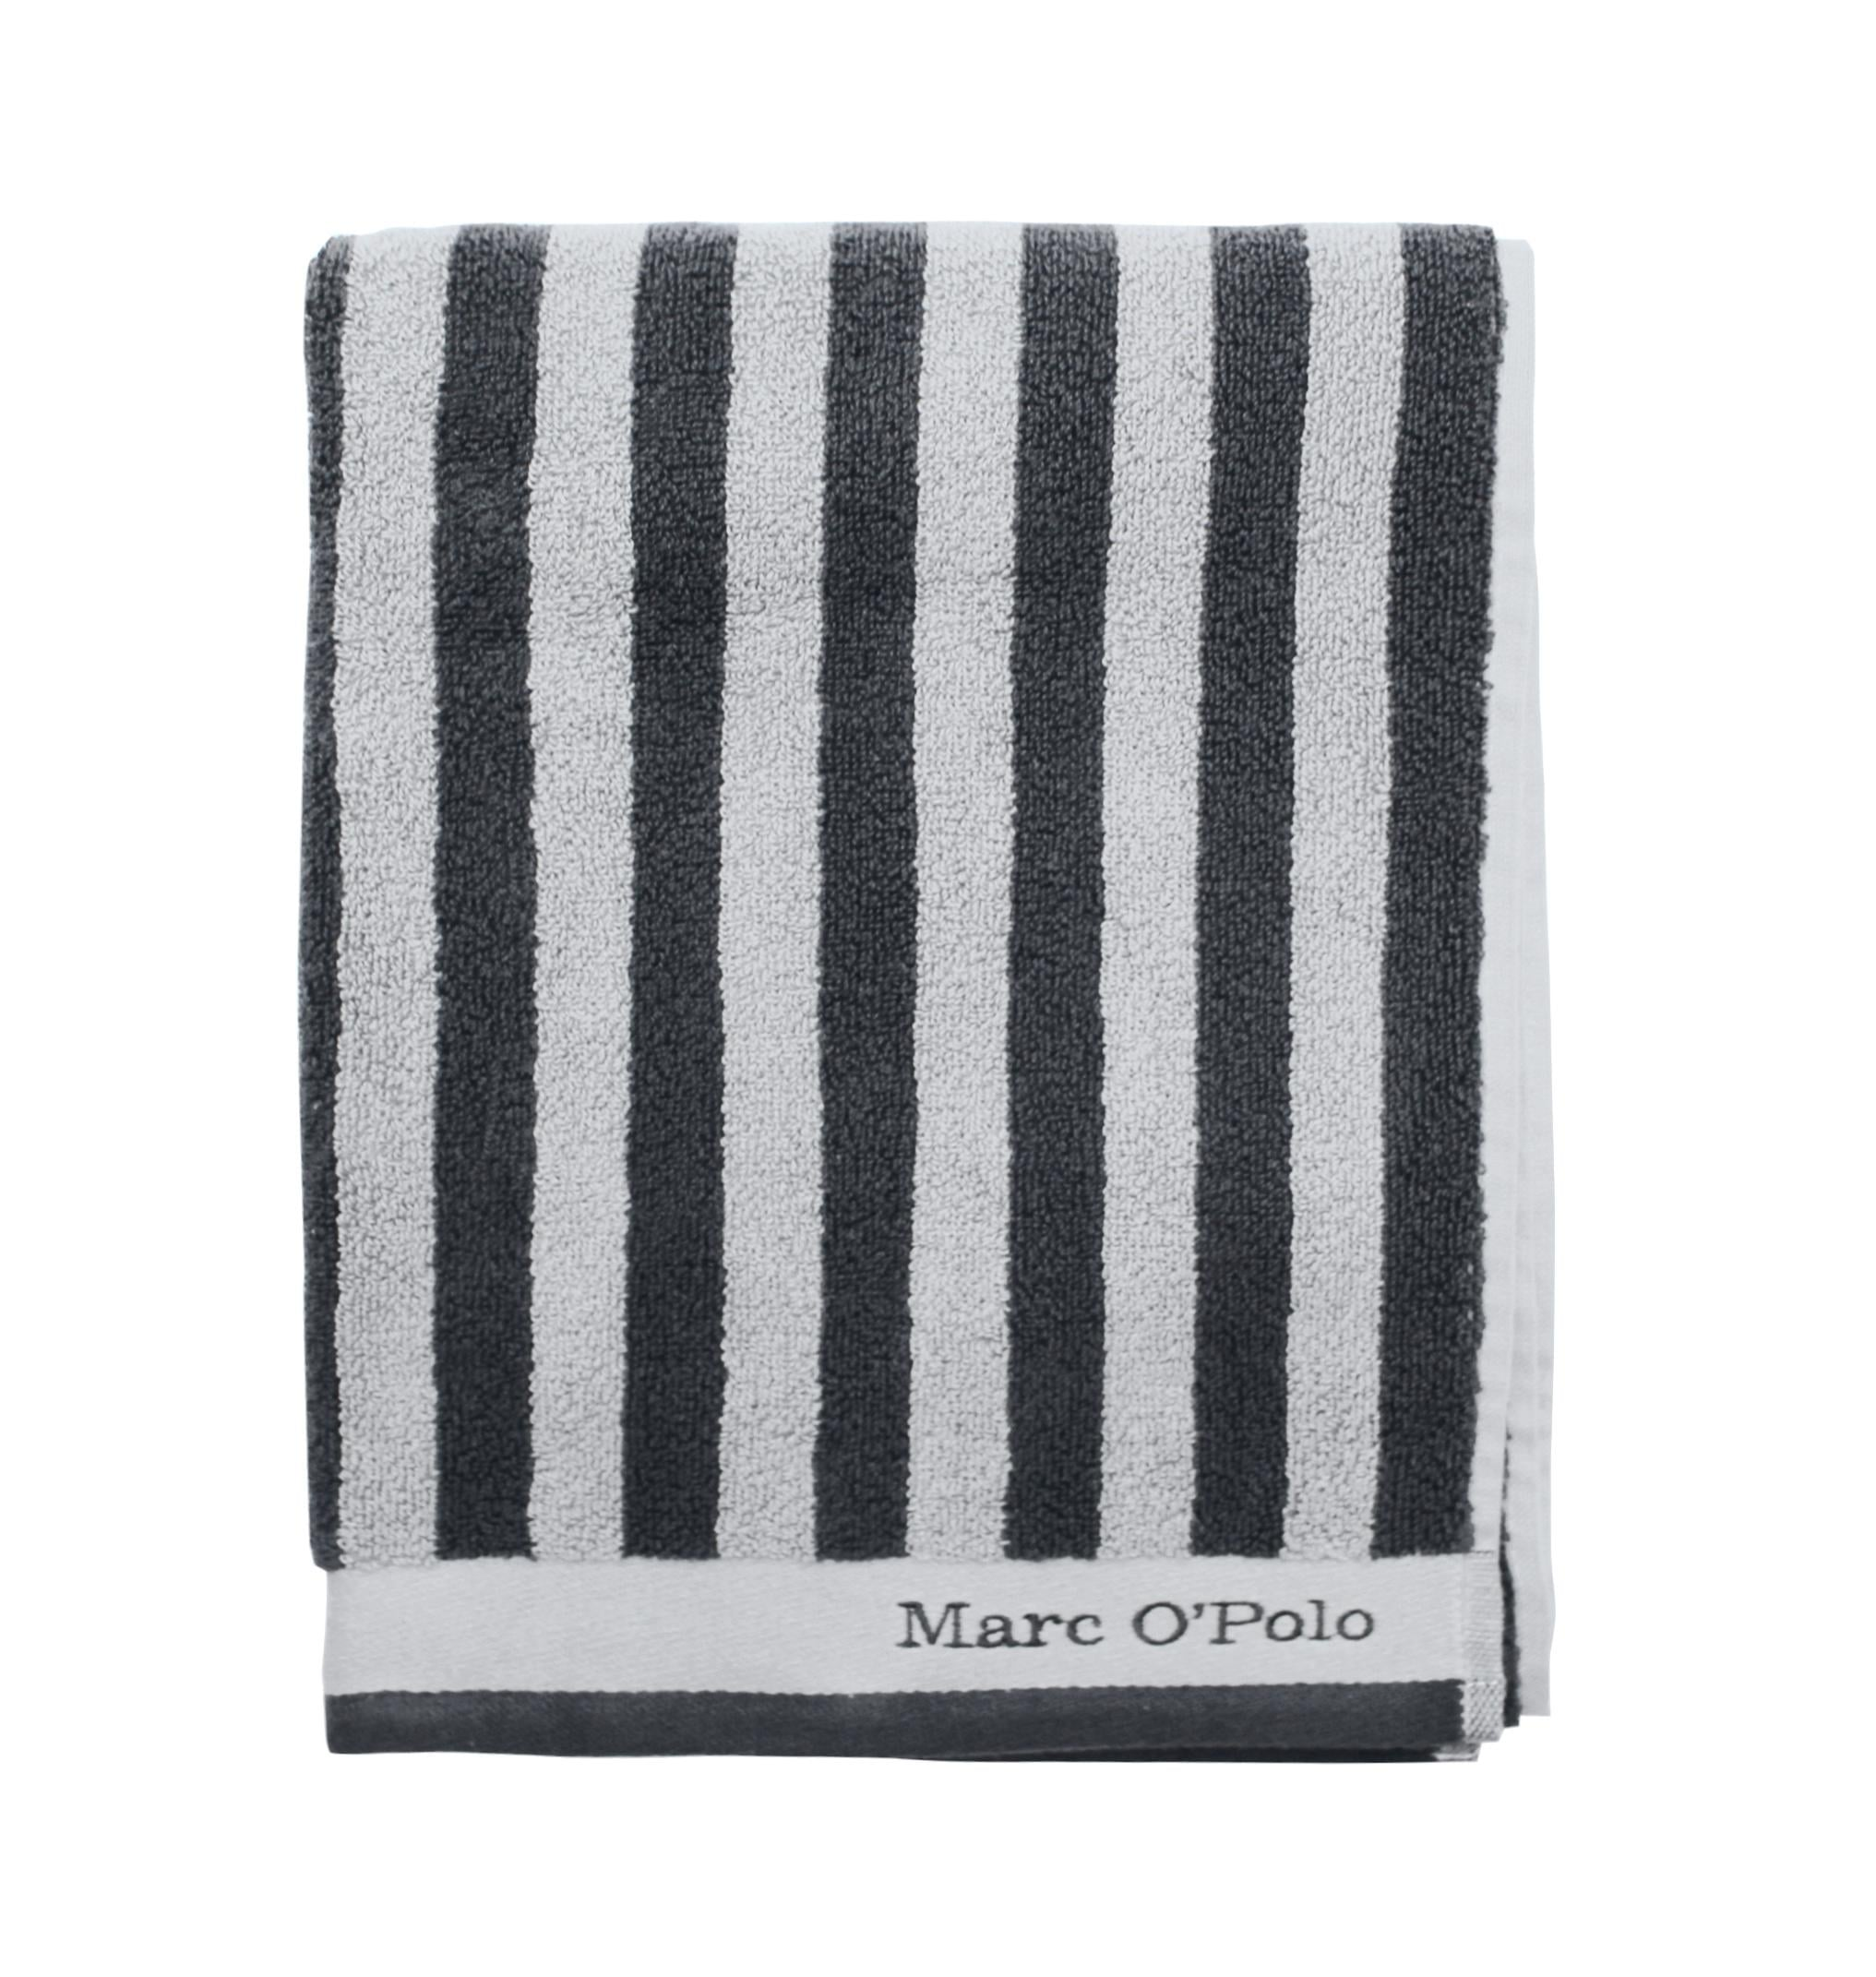 Badetuch, Marc O'Polo, »Classic Stripe«, im klassischen Streifen Design | Bad > Handtücher > Badetücher | Grau | Marc O'Polo